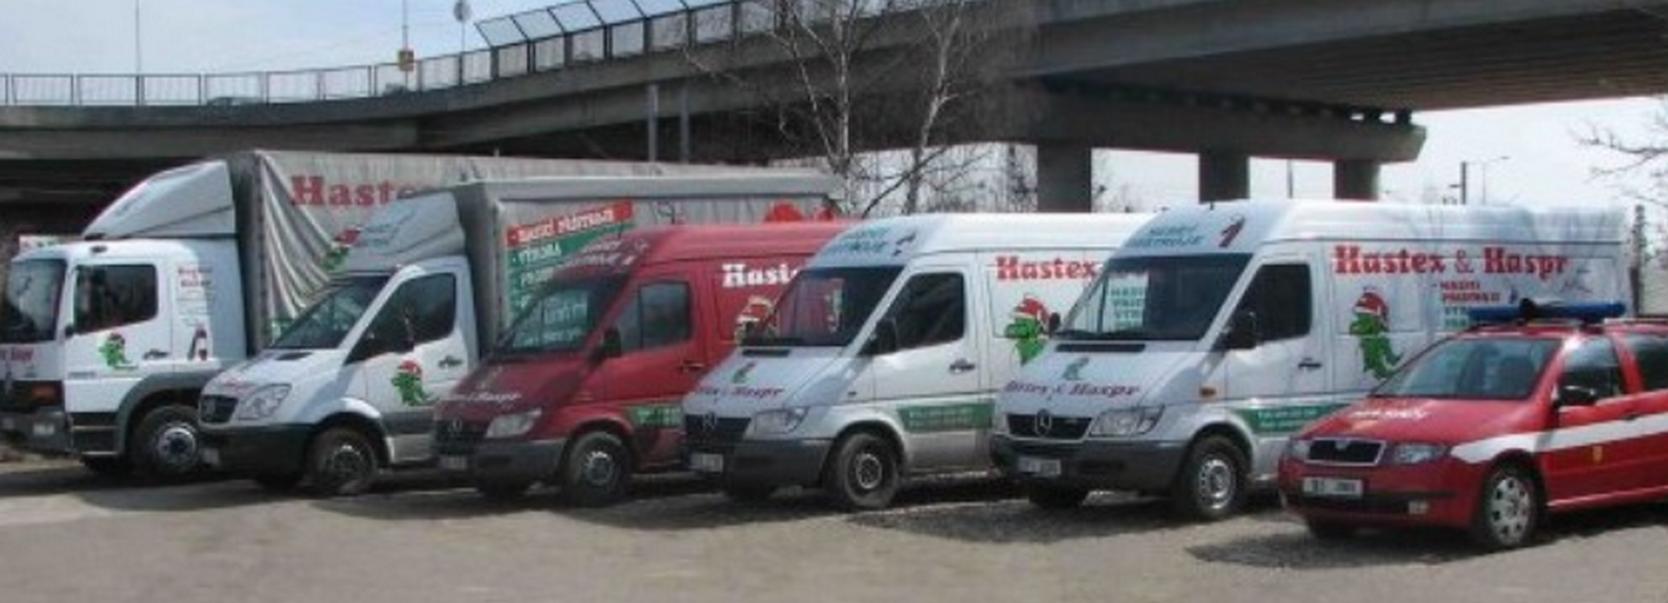 HASTEX & HASPR s.r.o. - fotografie 1/15